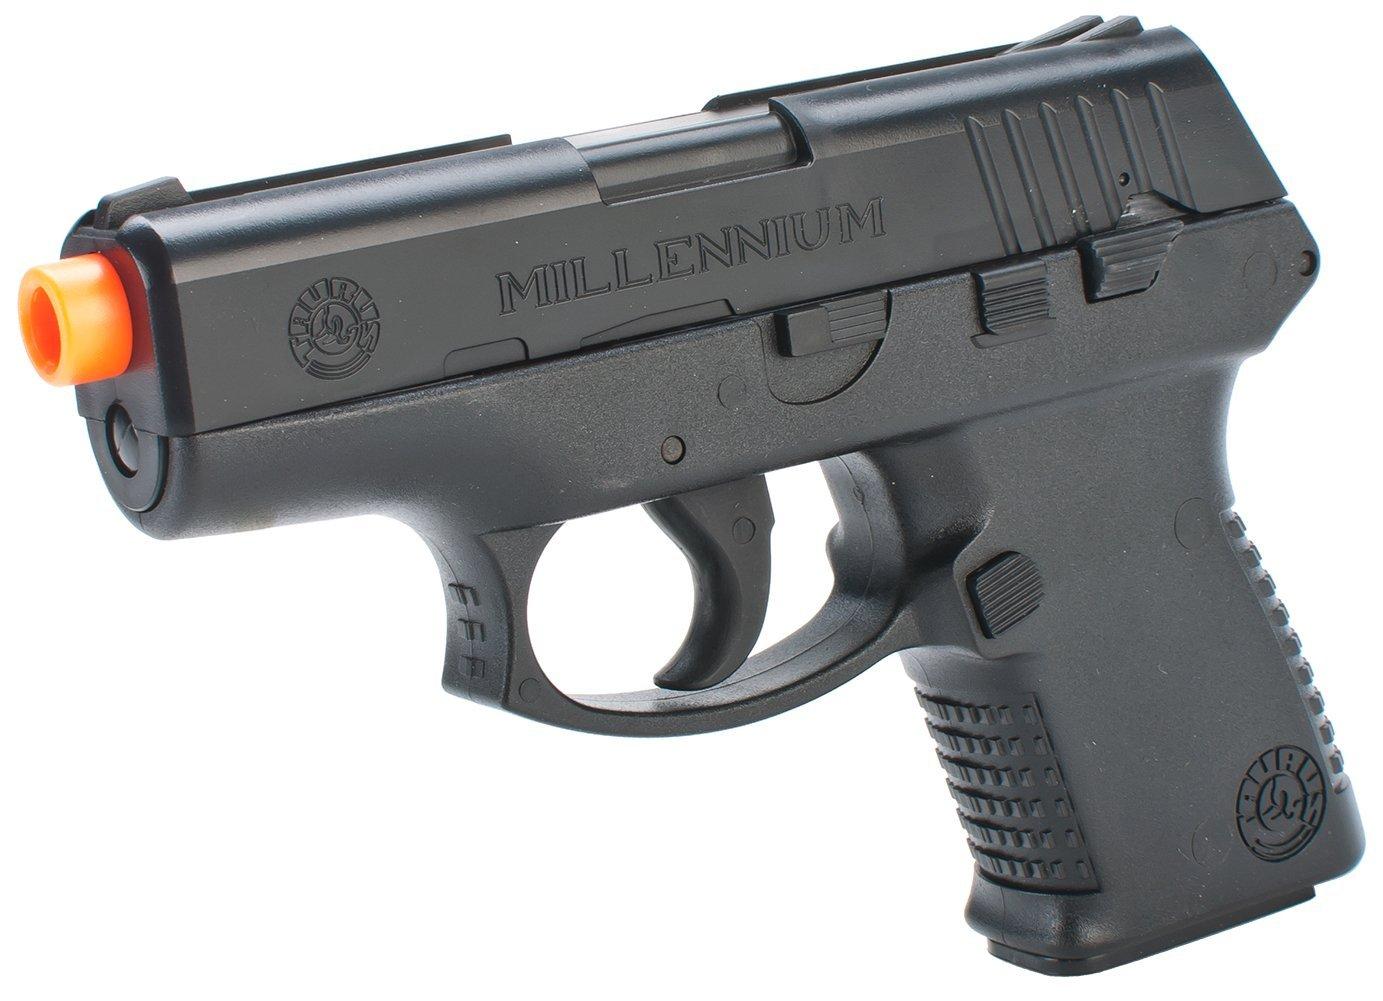 amazon com pistols guns rifles sports outdoors rh amazon com Ruger P99 MW3 All Guns